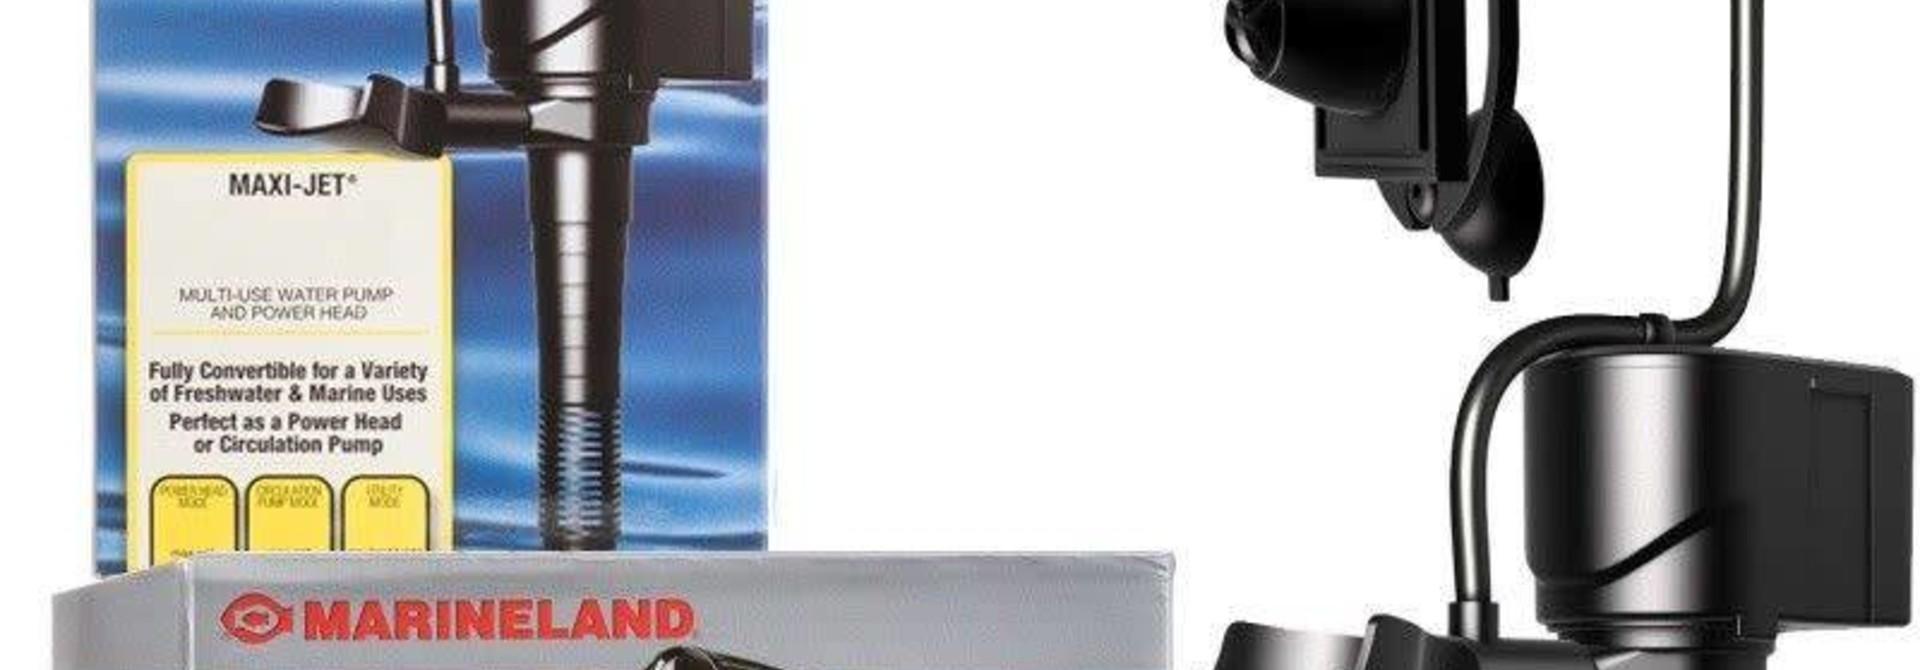 Marineland Maxi-Jet 1200 Multi-Use Water Pump